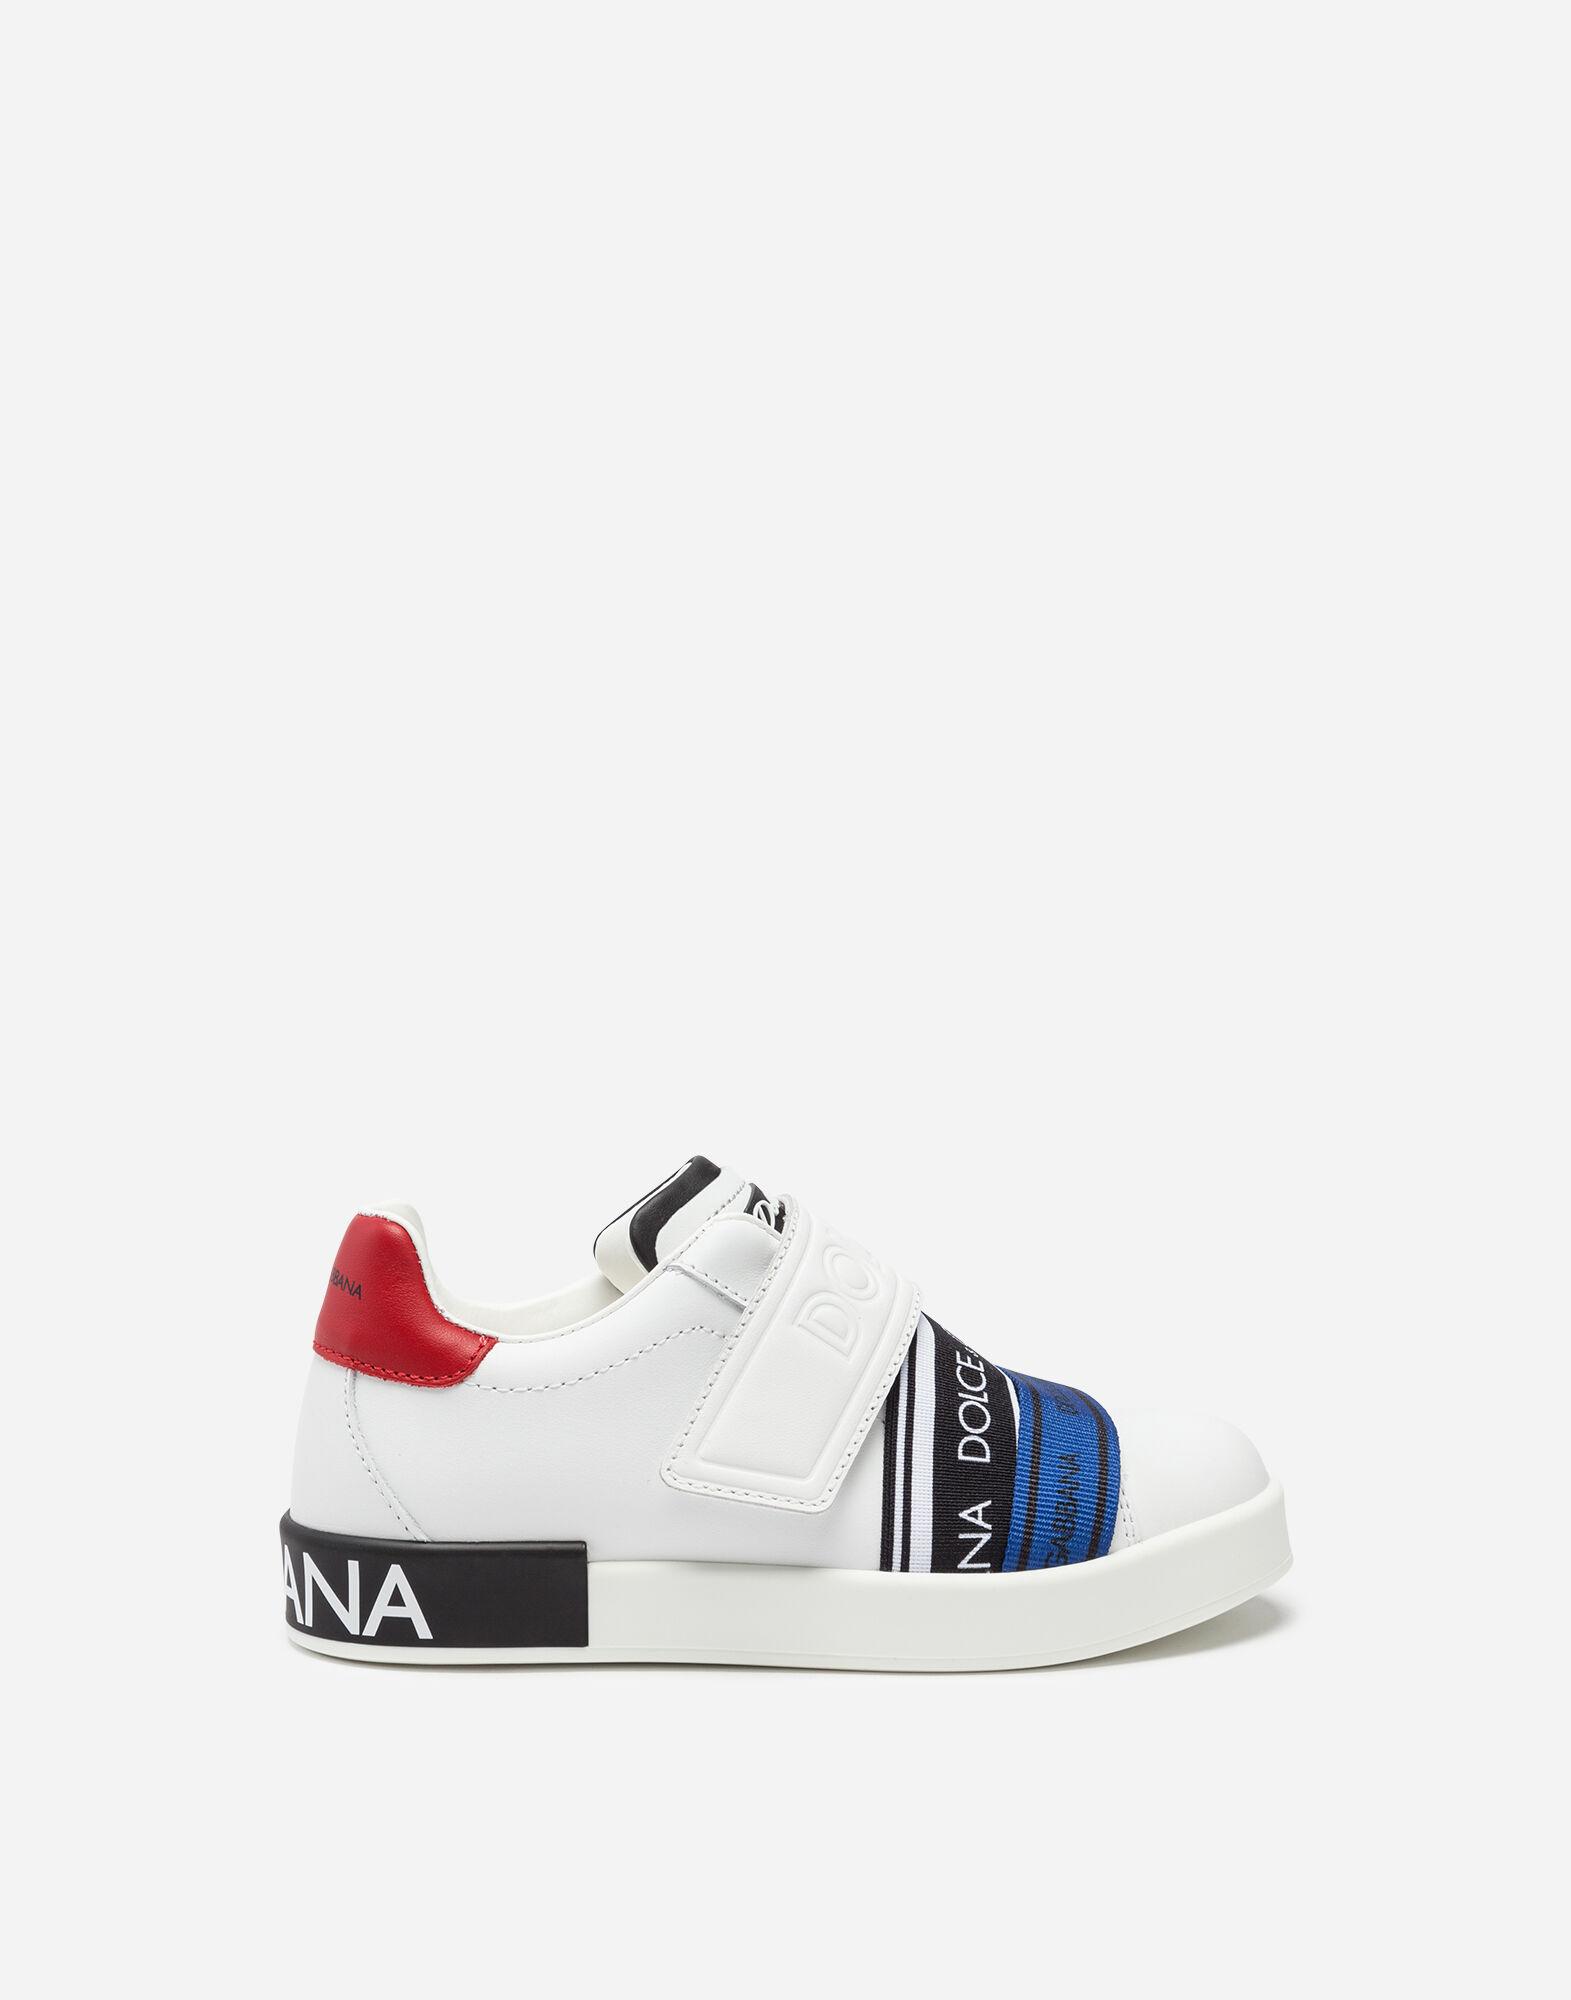 Portofino Sneakers with Tape - Boy's